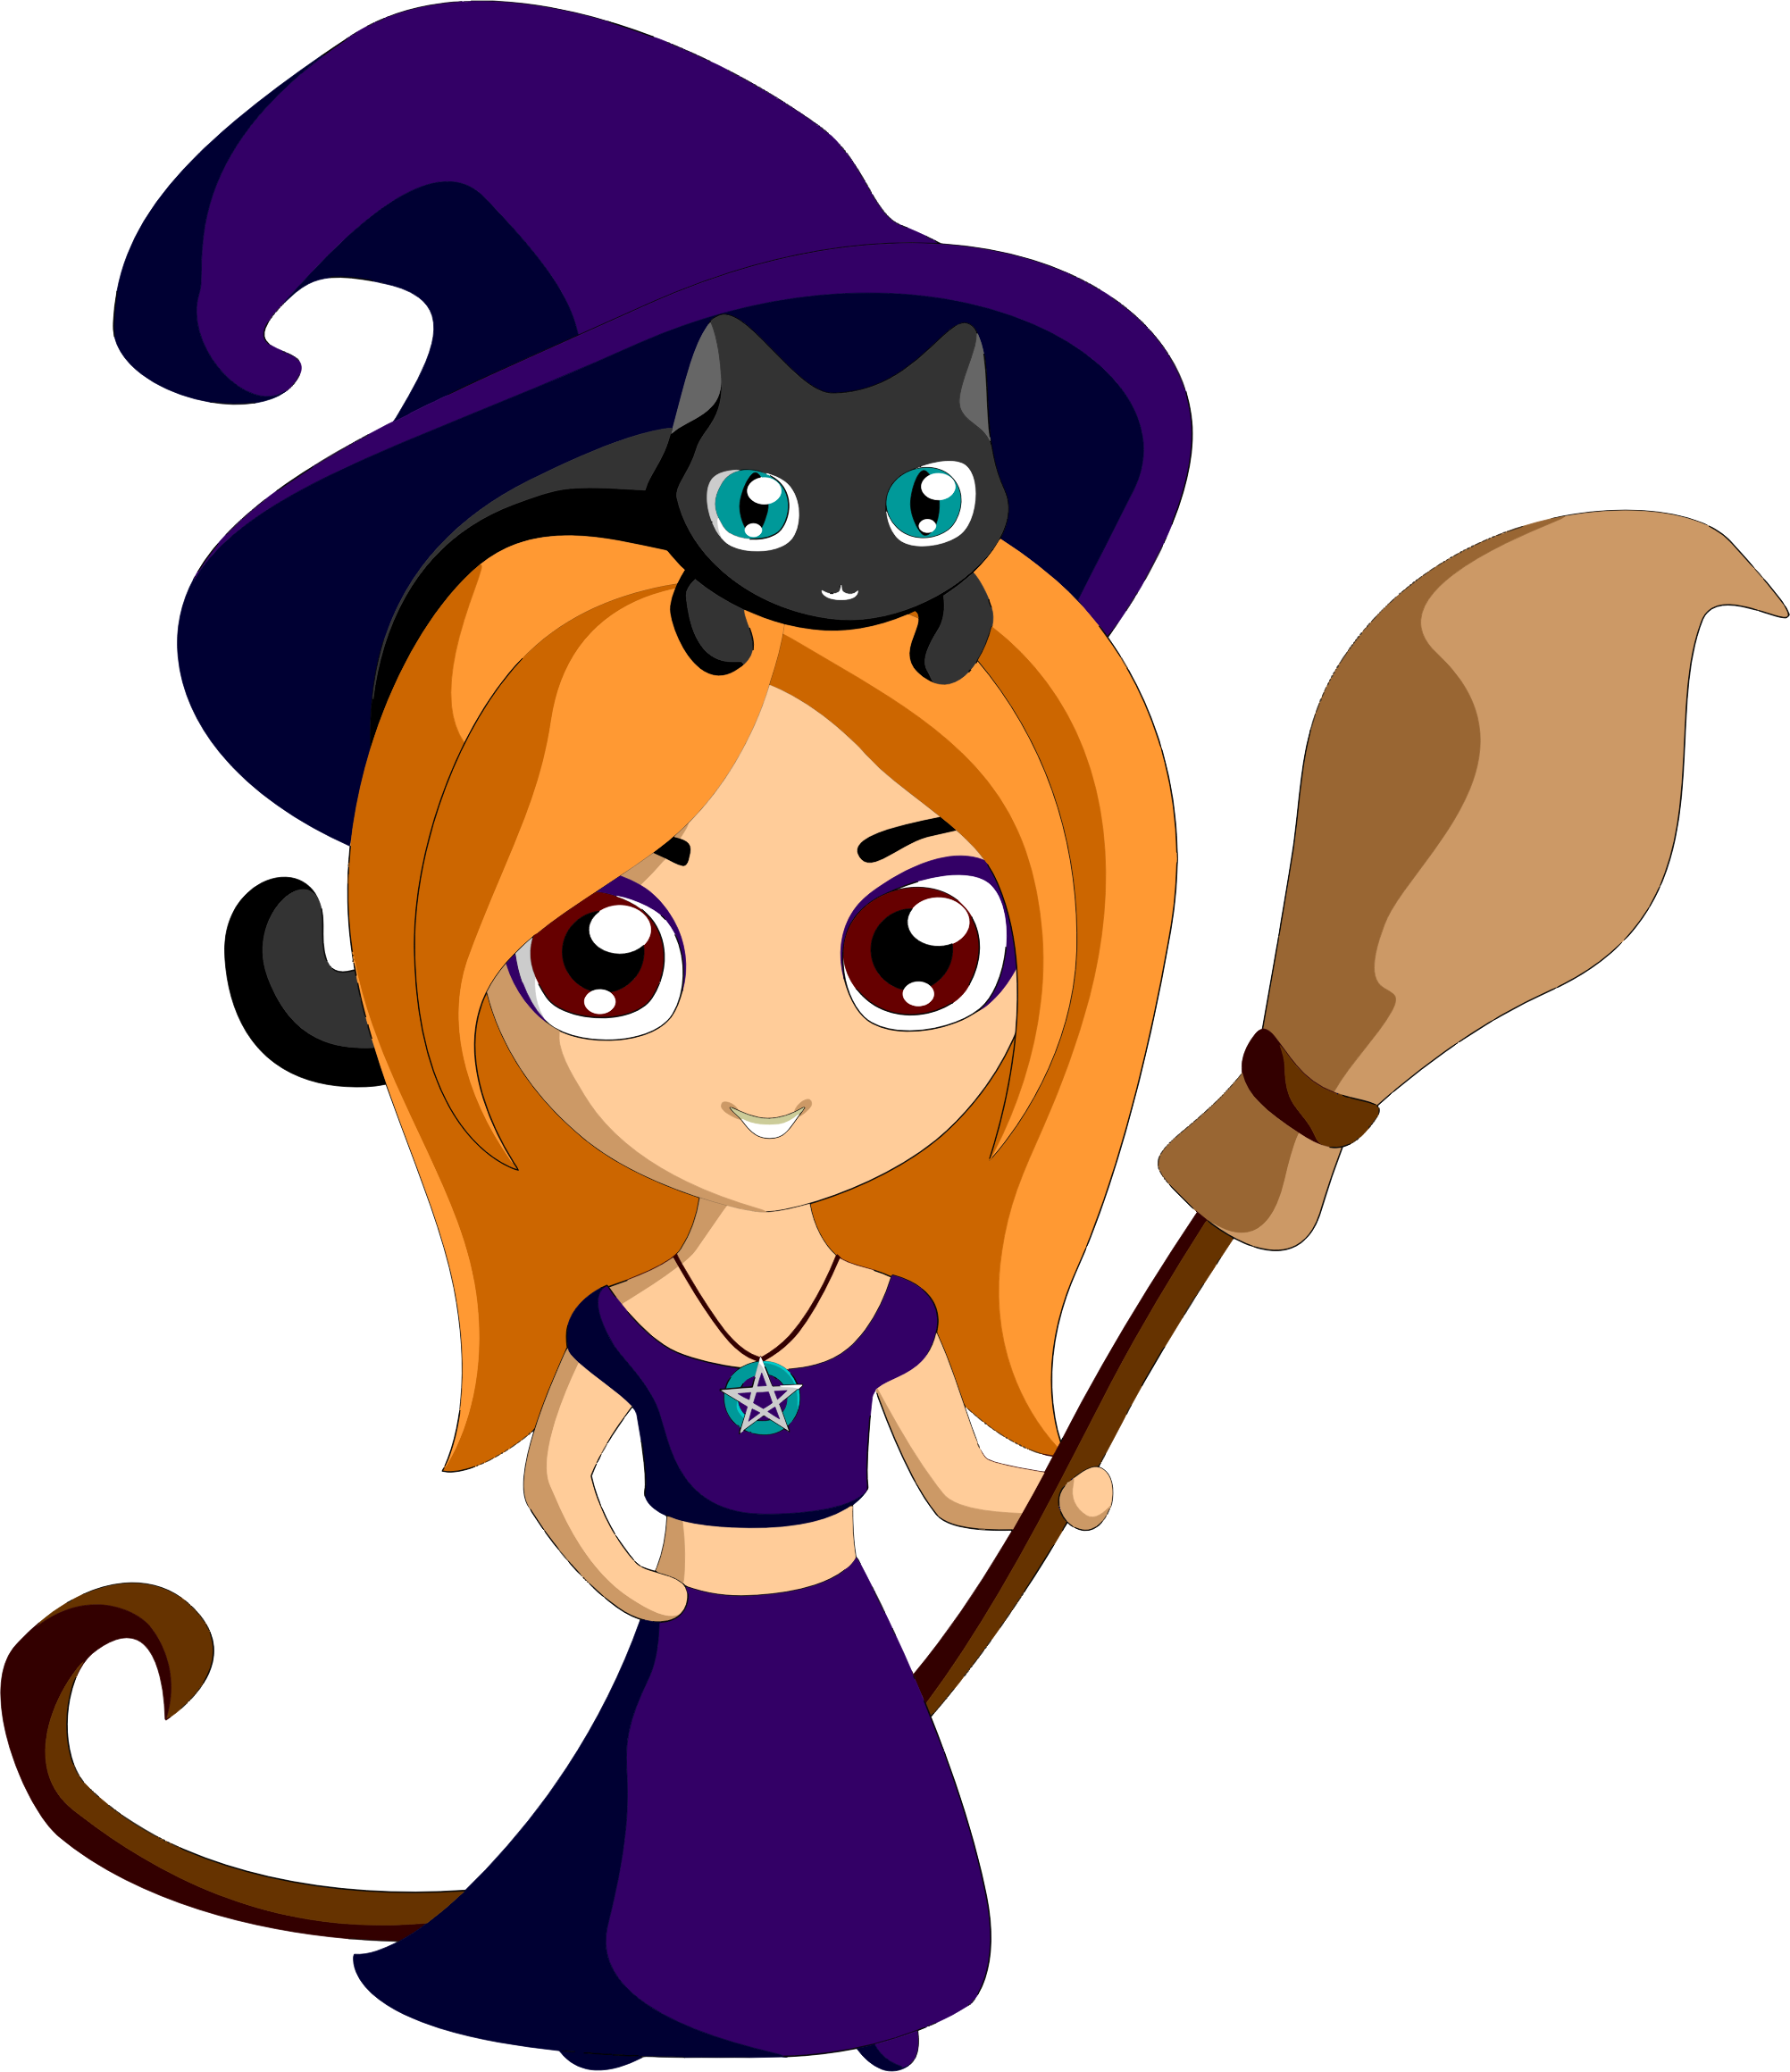 Clipart - Cute Witch By iirliinnaa